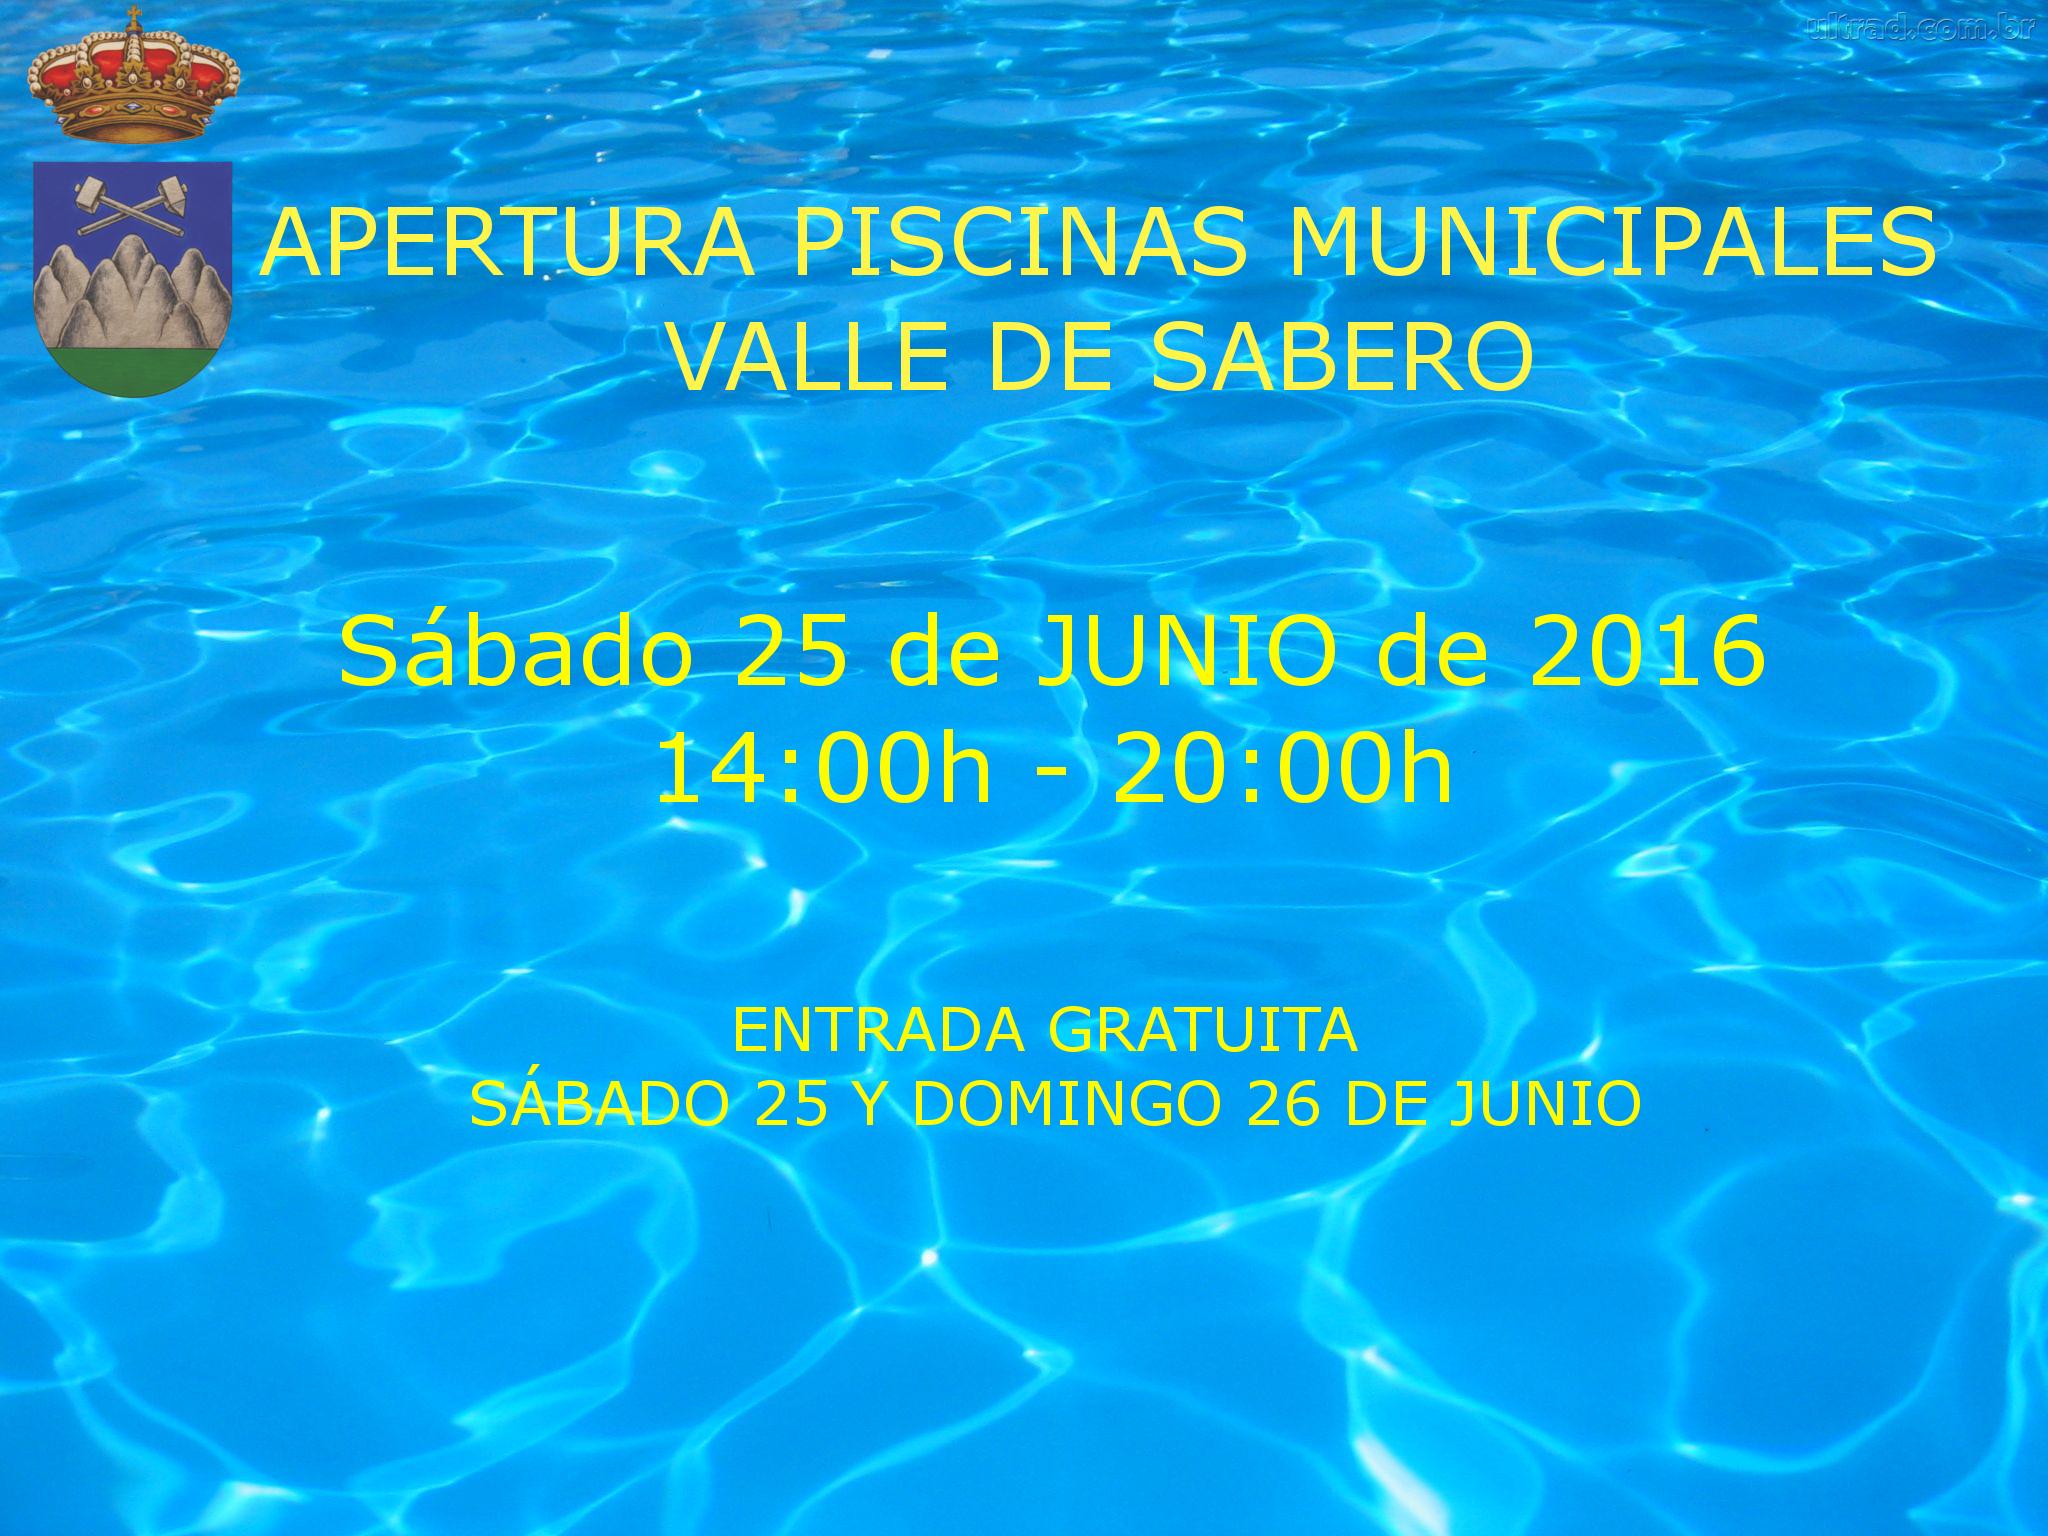 Apertura de las piscinas municipales temporada 2016 for Piscinas municipales madrid 2016